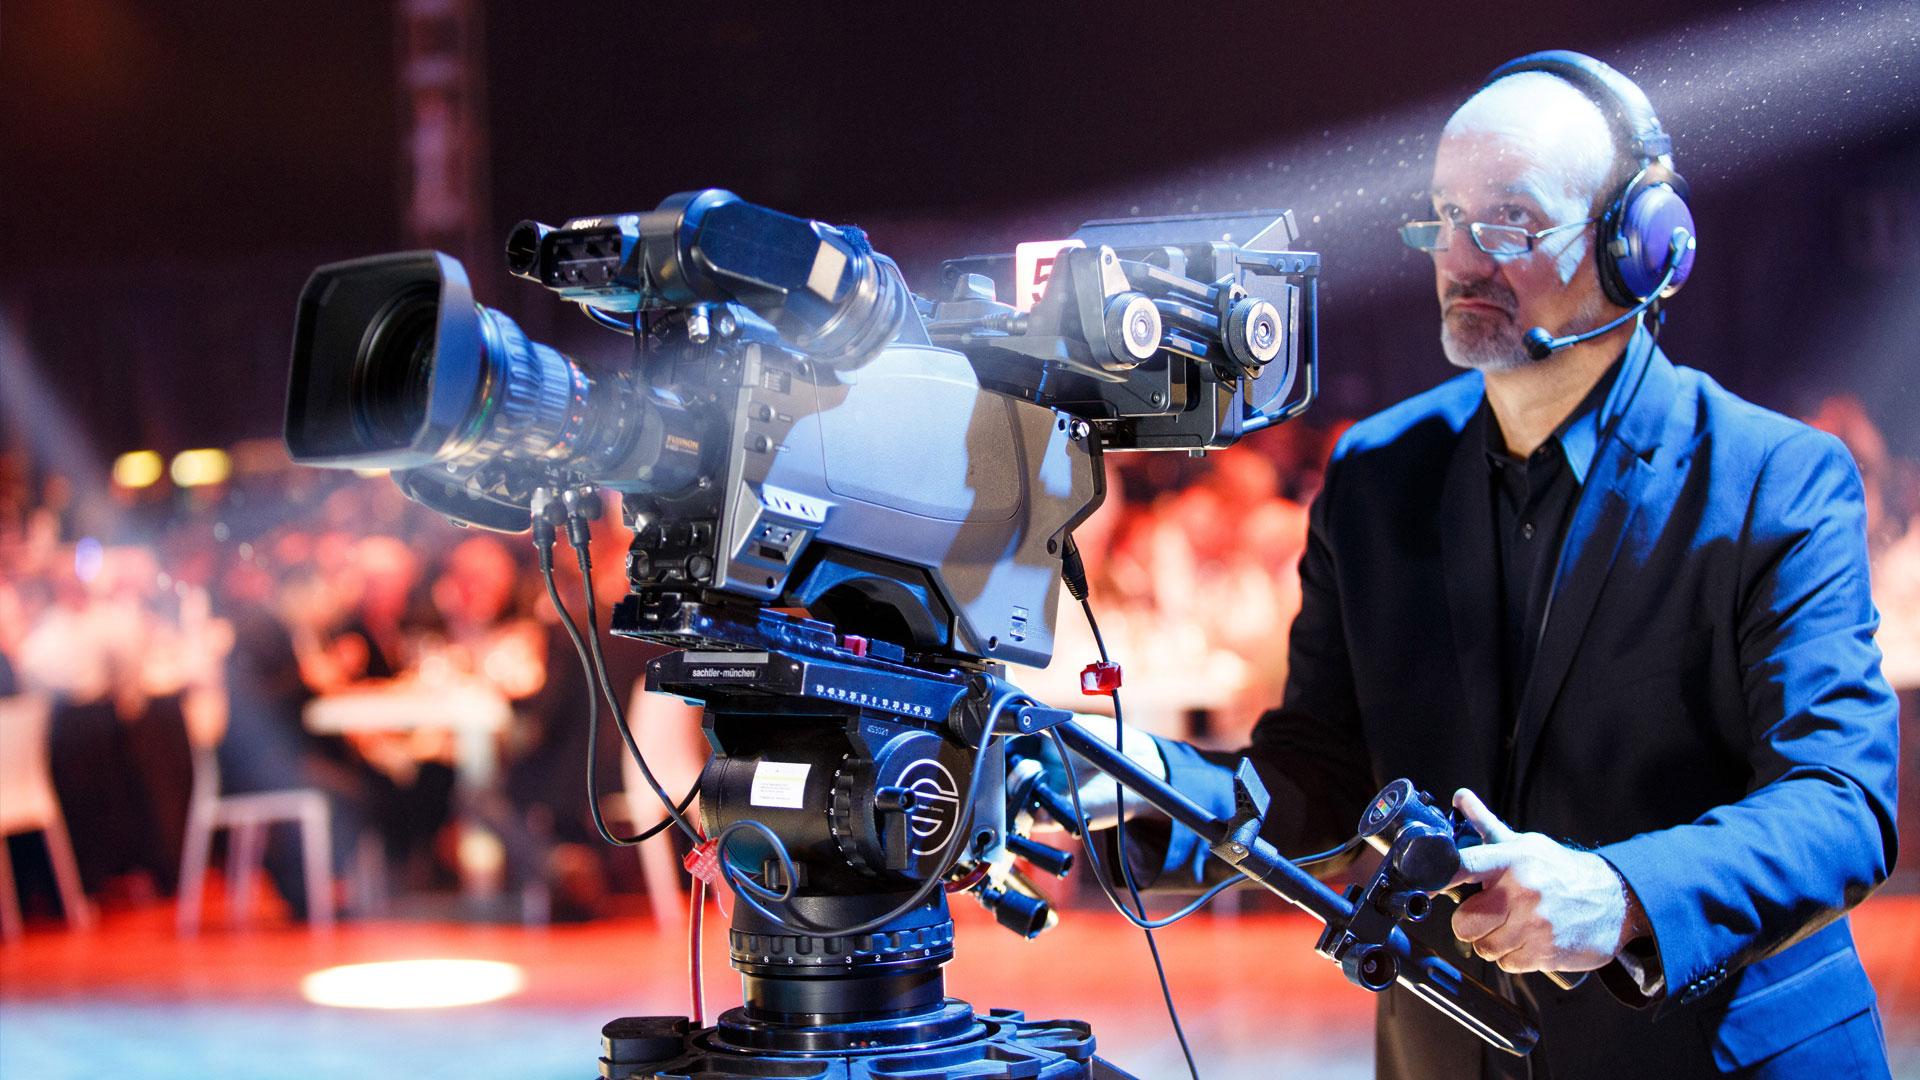 Kameramann mit Studiokamera